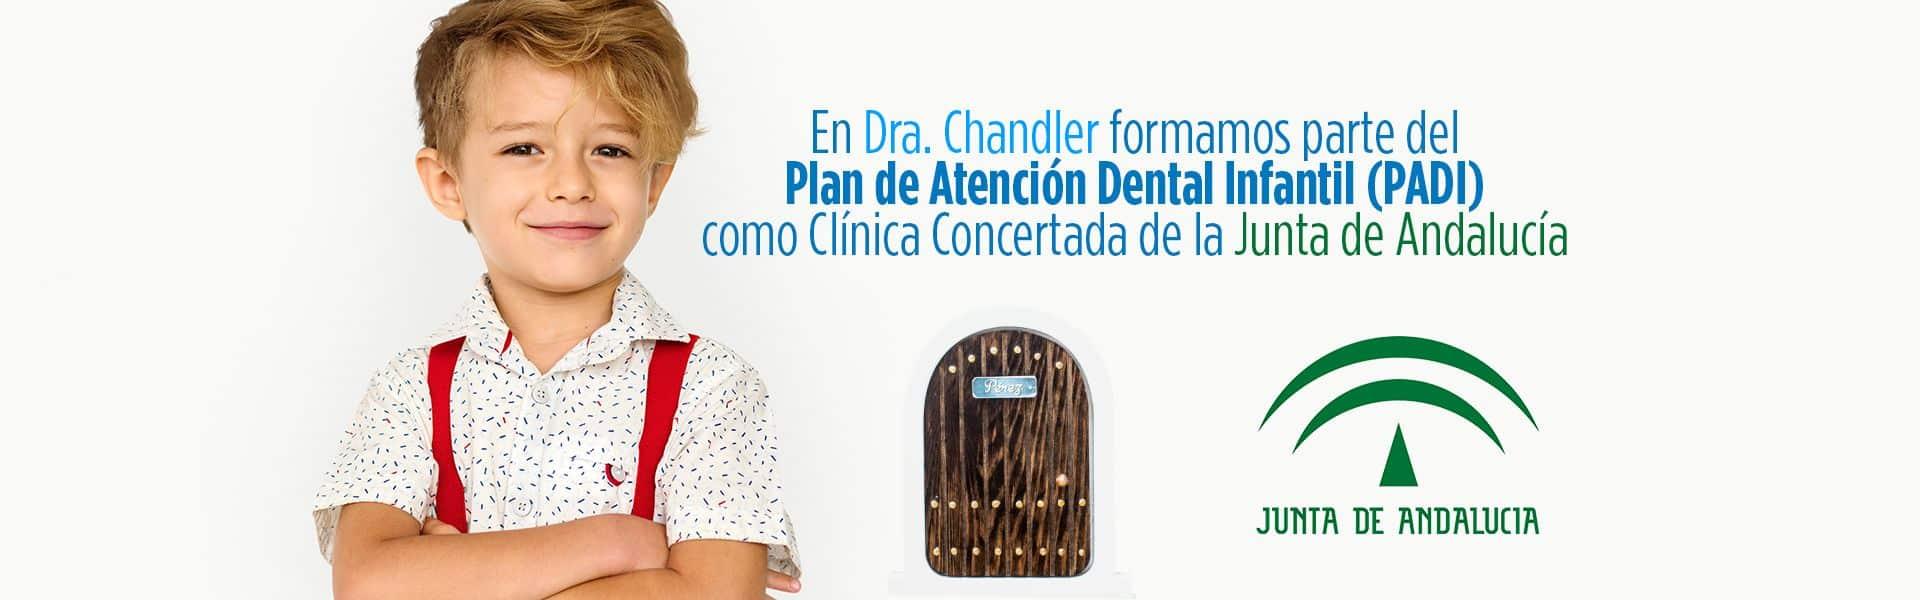 PADI plan de atencion dental infantil chandler